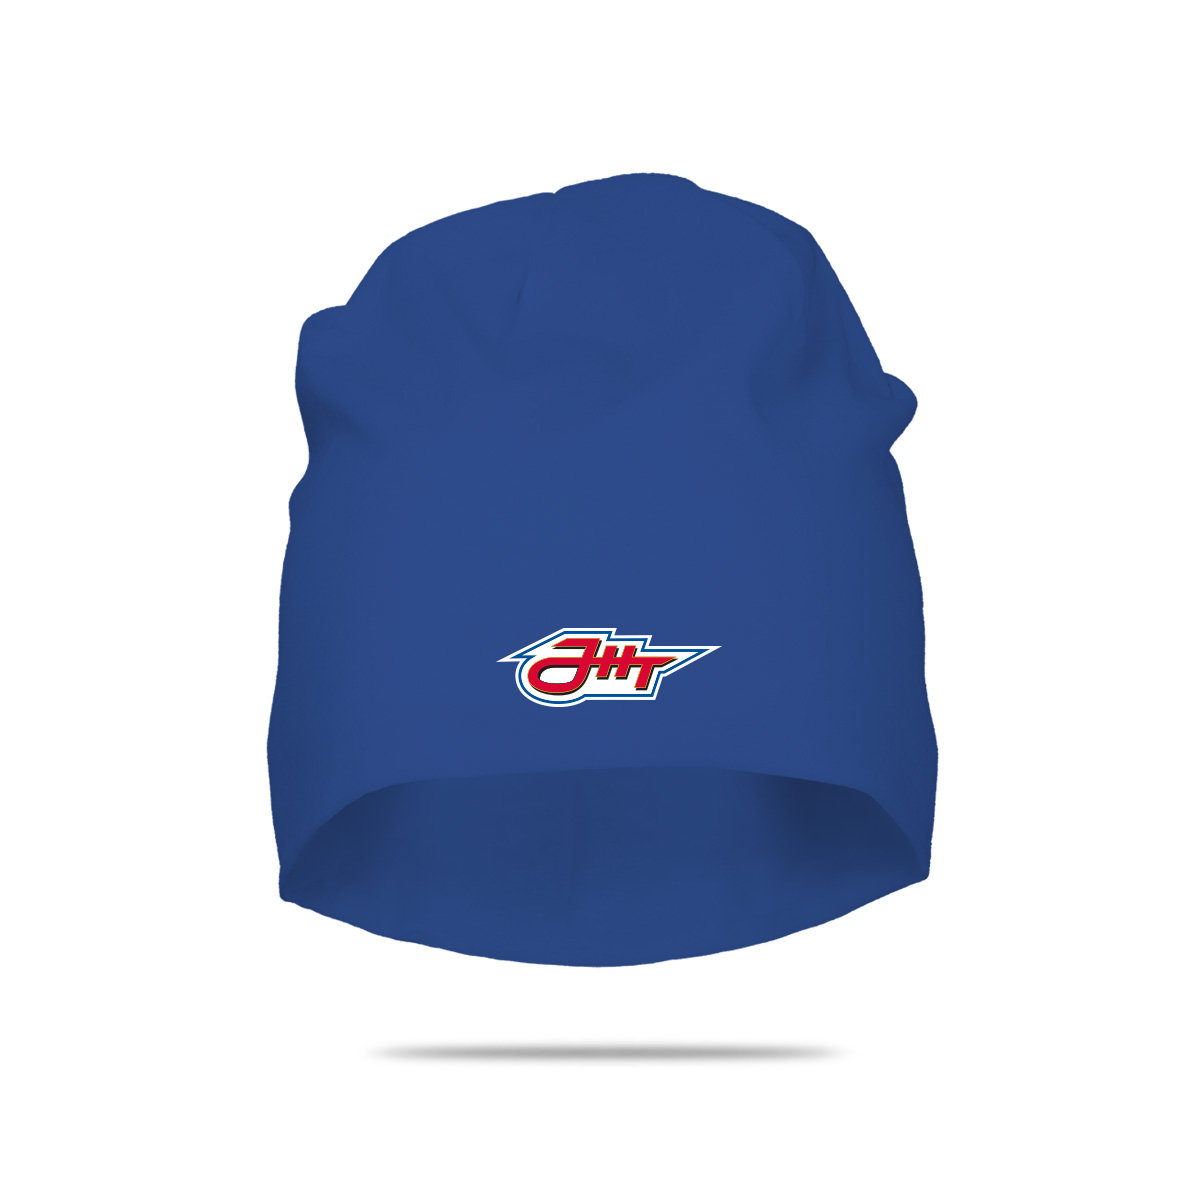 Teamprint-Pujo-JHT-Sininen